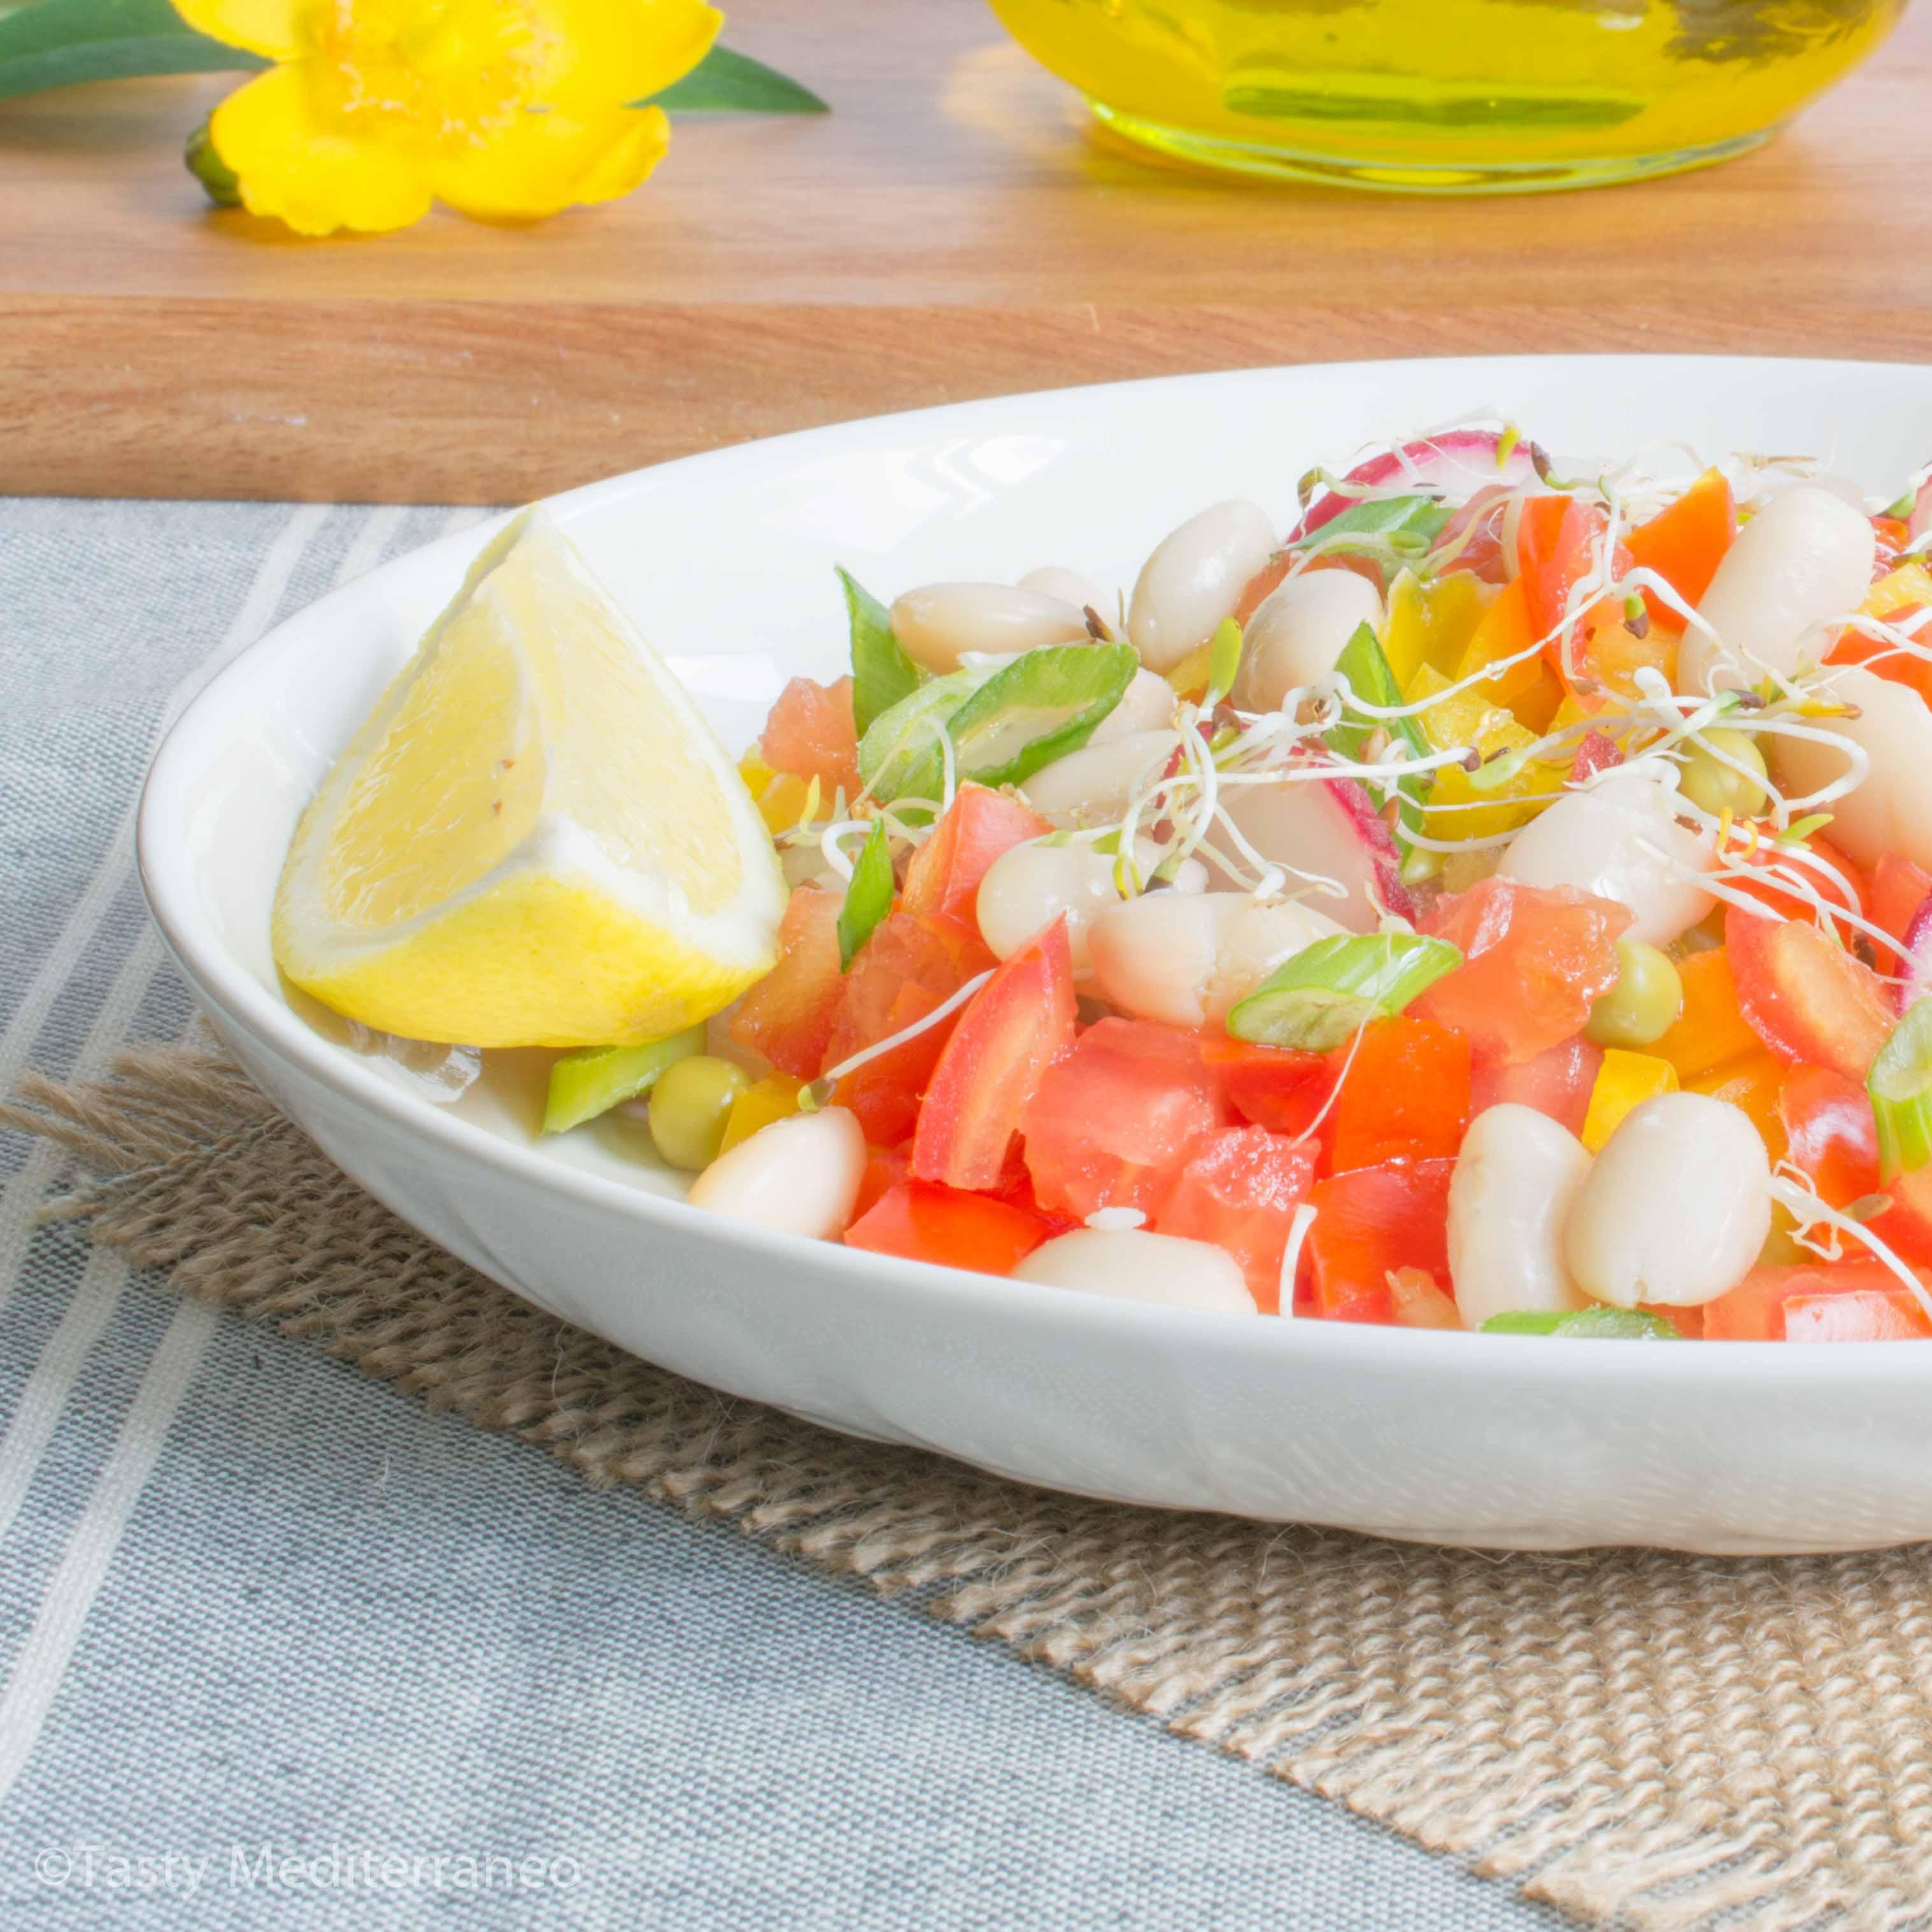 Tasty-Mediterraneo-cannellini-bean-salad